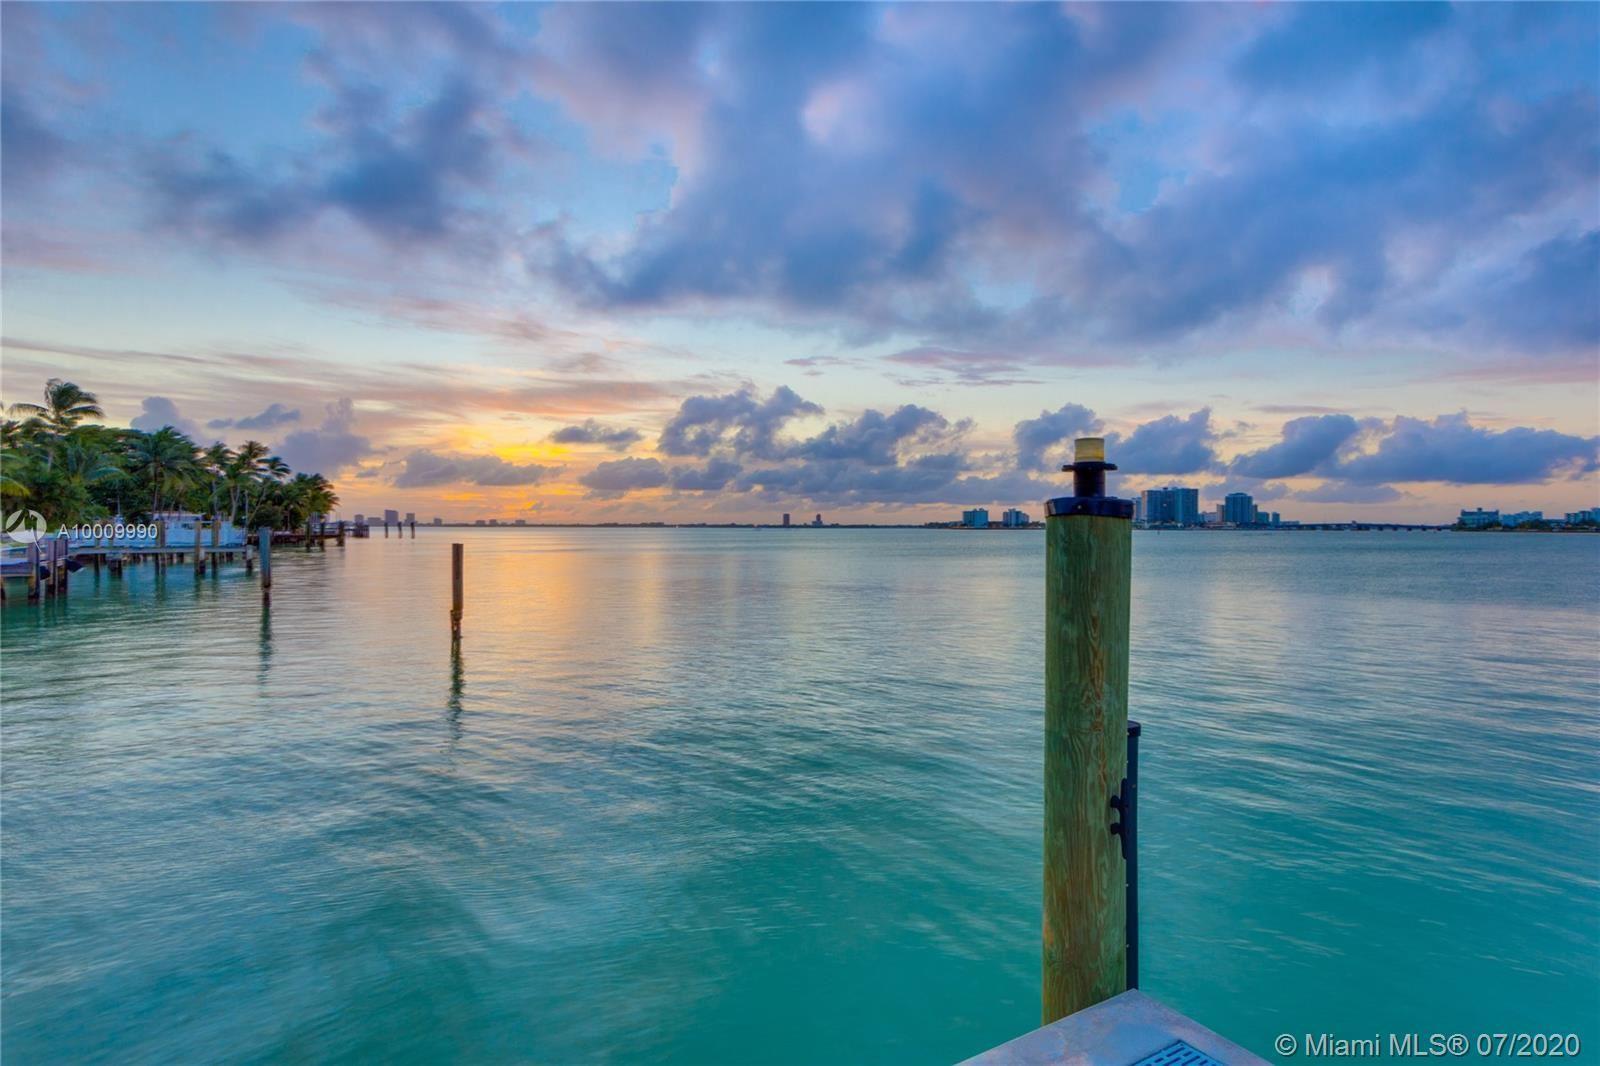 Photo 2 of Listing MLS a10009990 in 6050 N Bay Rd Miami Beach FL 33140